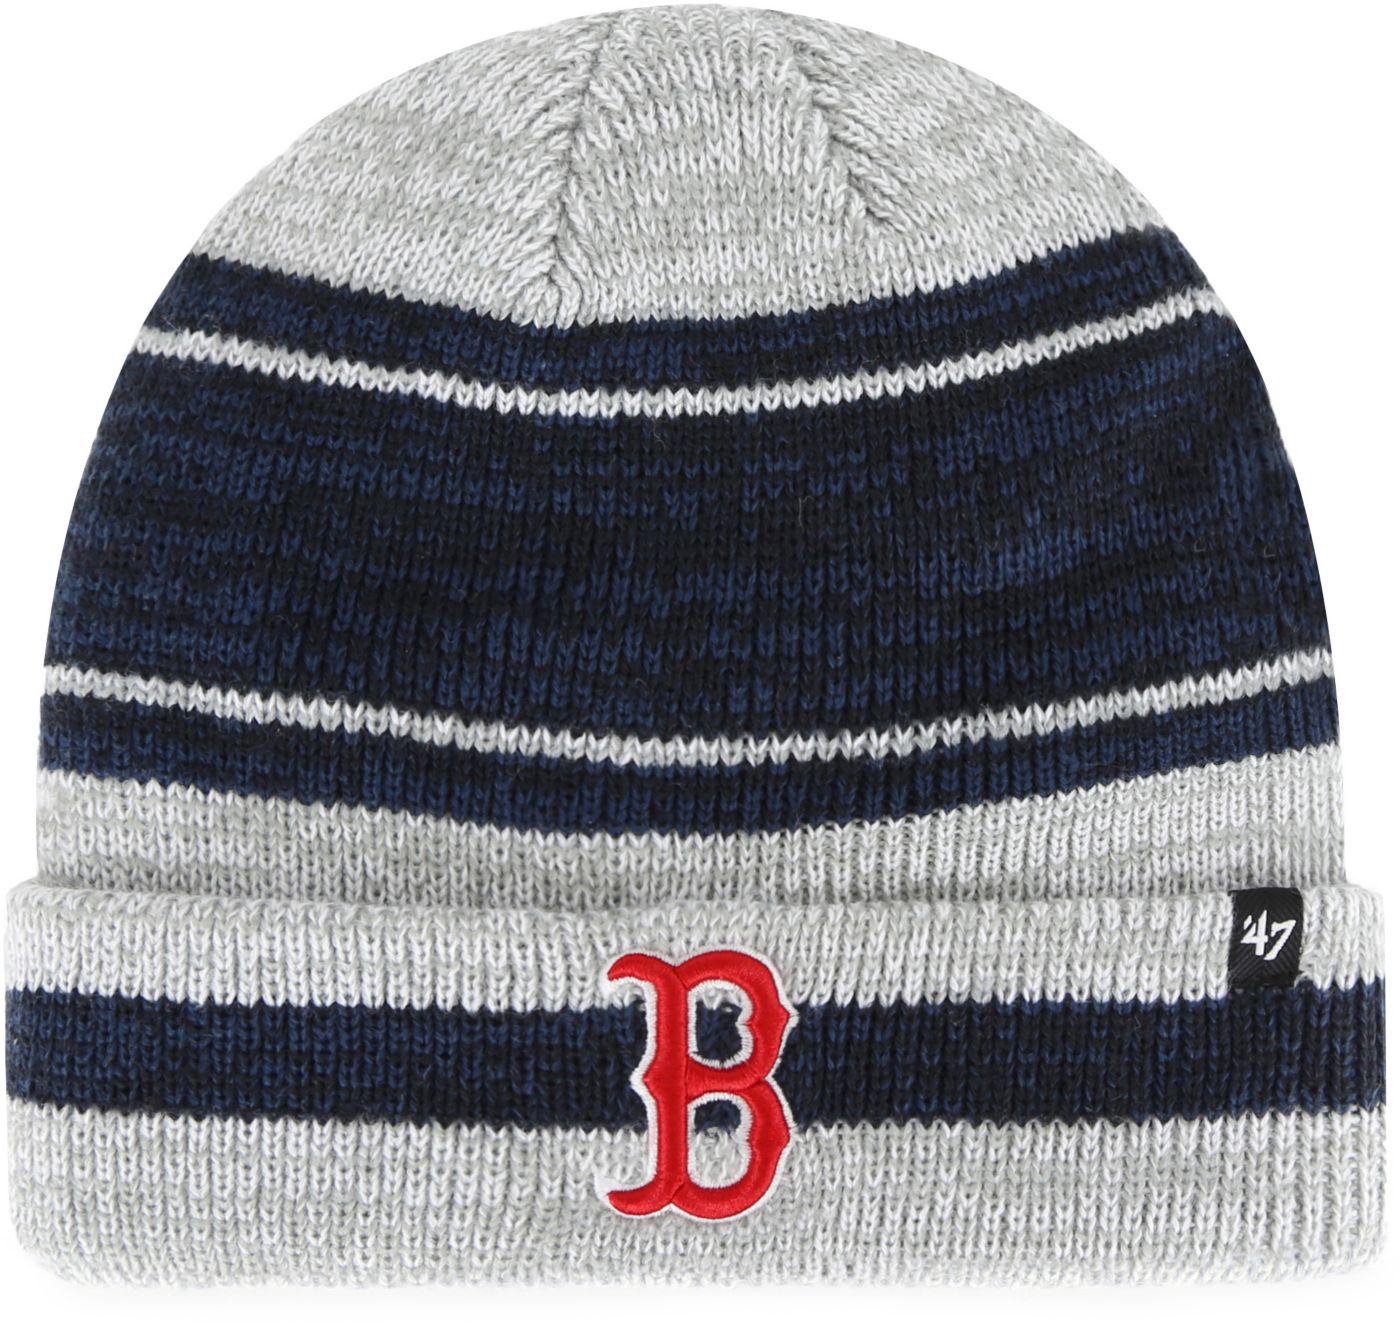 '47 Men's Boston Red Sox Knit Hat